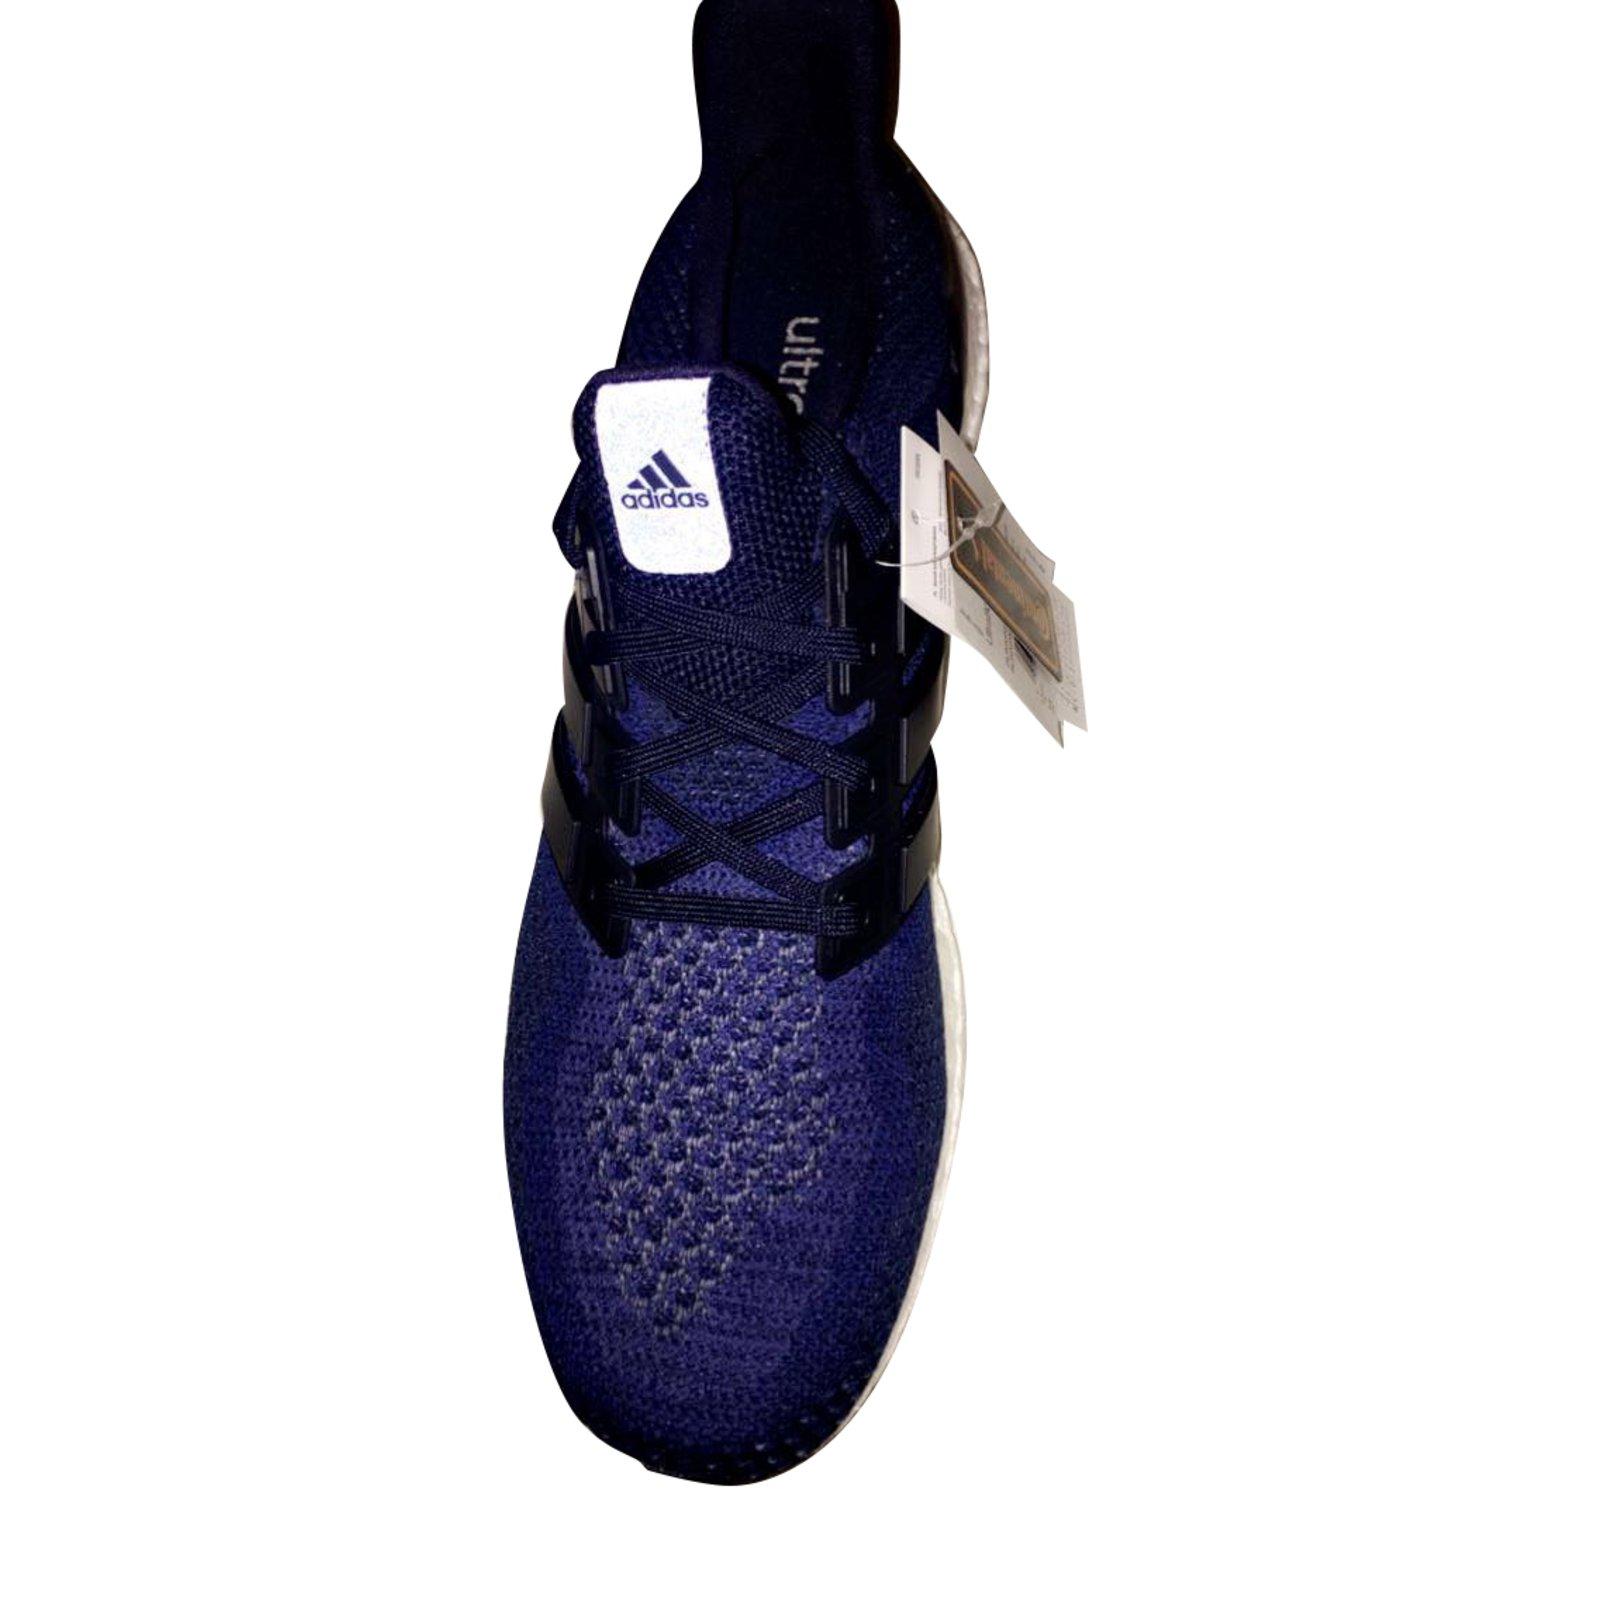 da2a68d7cbd8 Adidas Ultra boost M (AQ5928) Sneakers Synthetic Blue ref.31216 ...